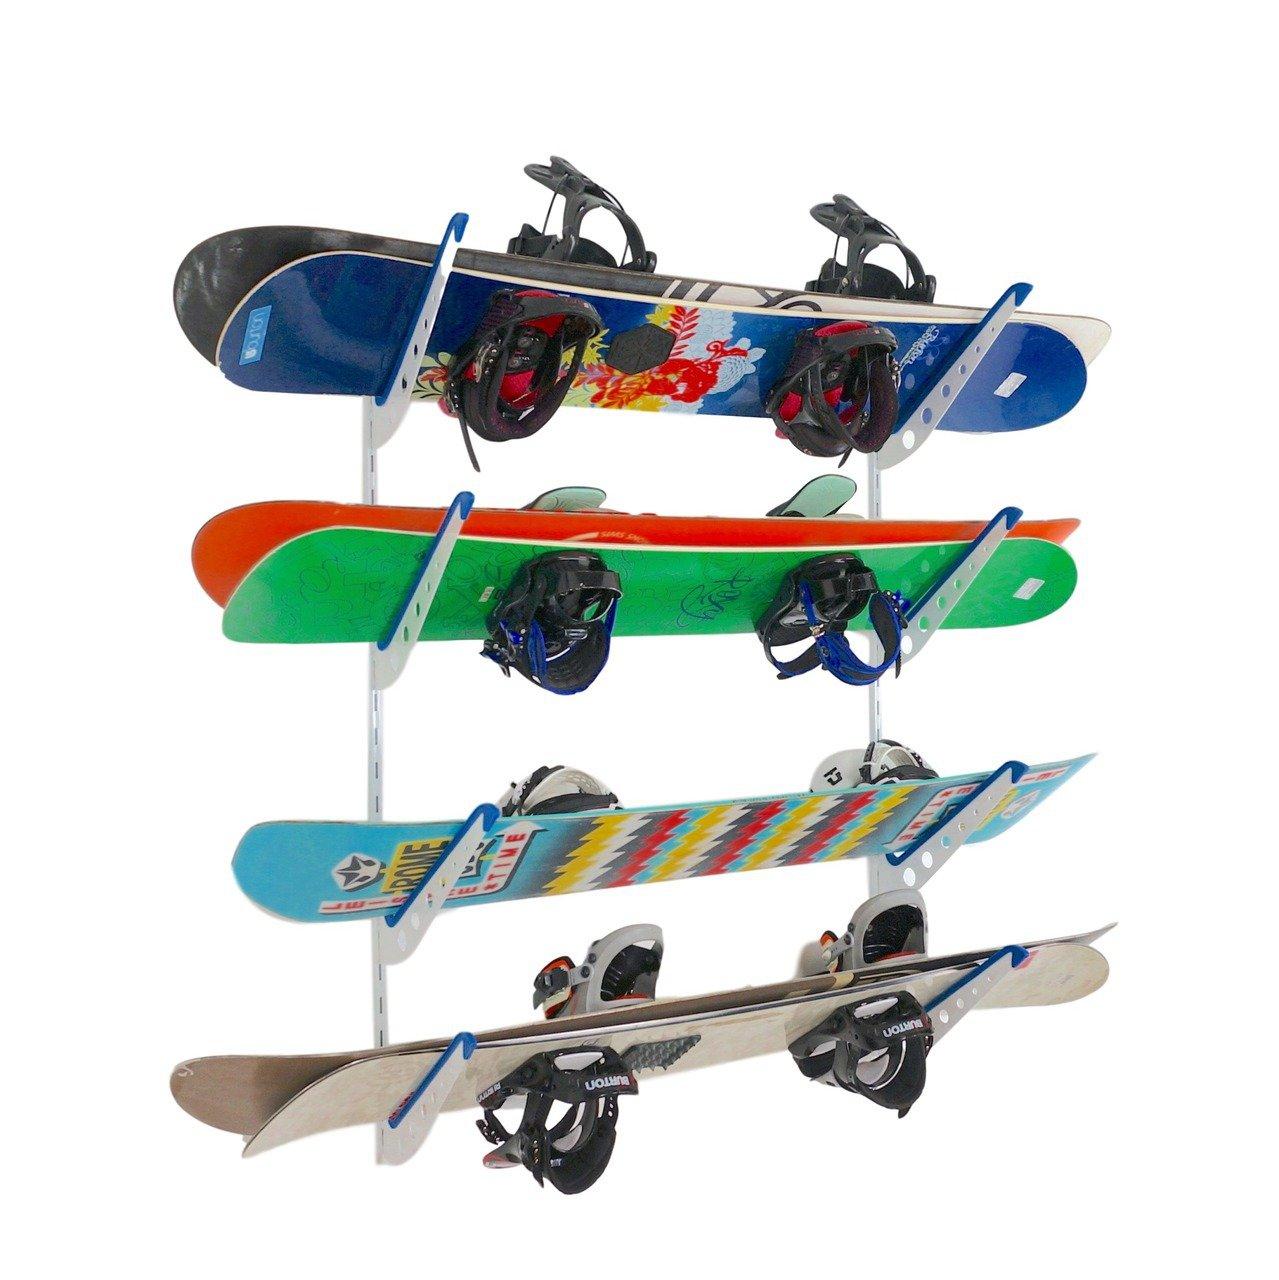 StoreYourBoard Snowboard Multi Wall Storage Rack | Home and Garage Mount